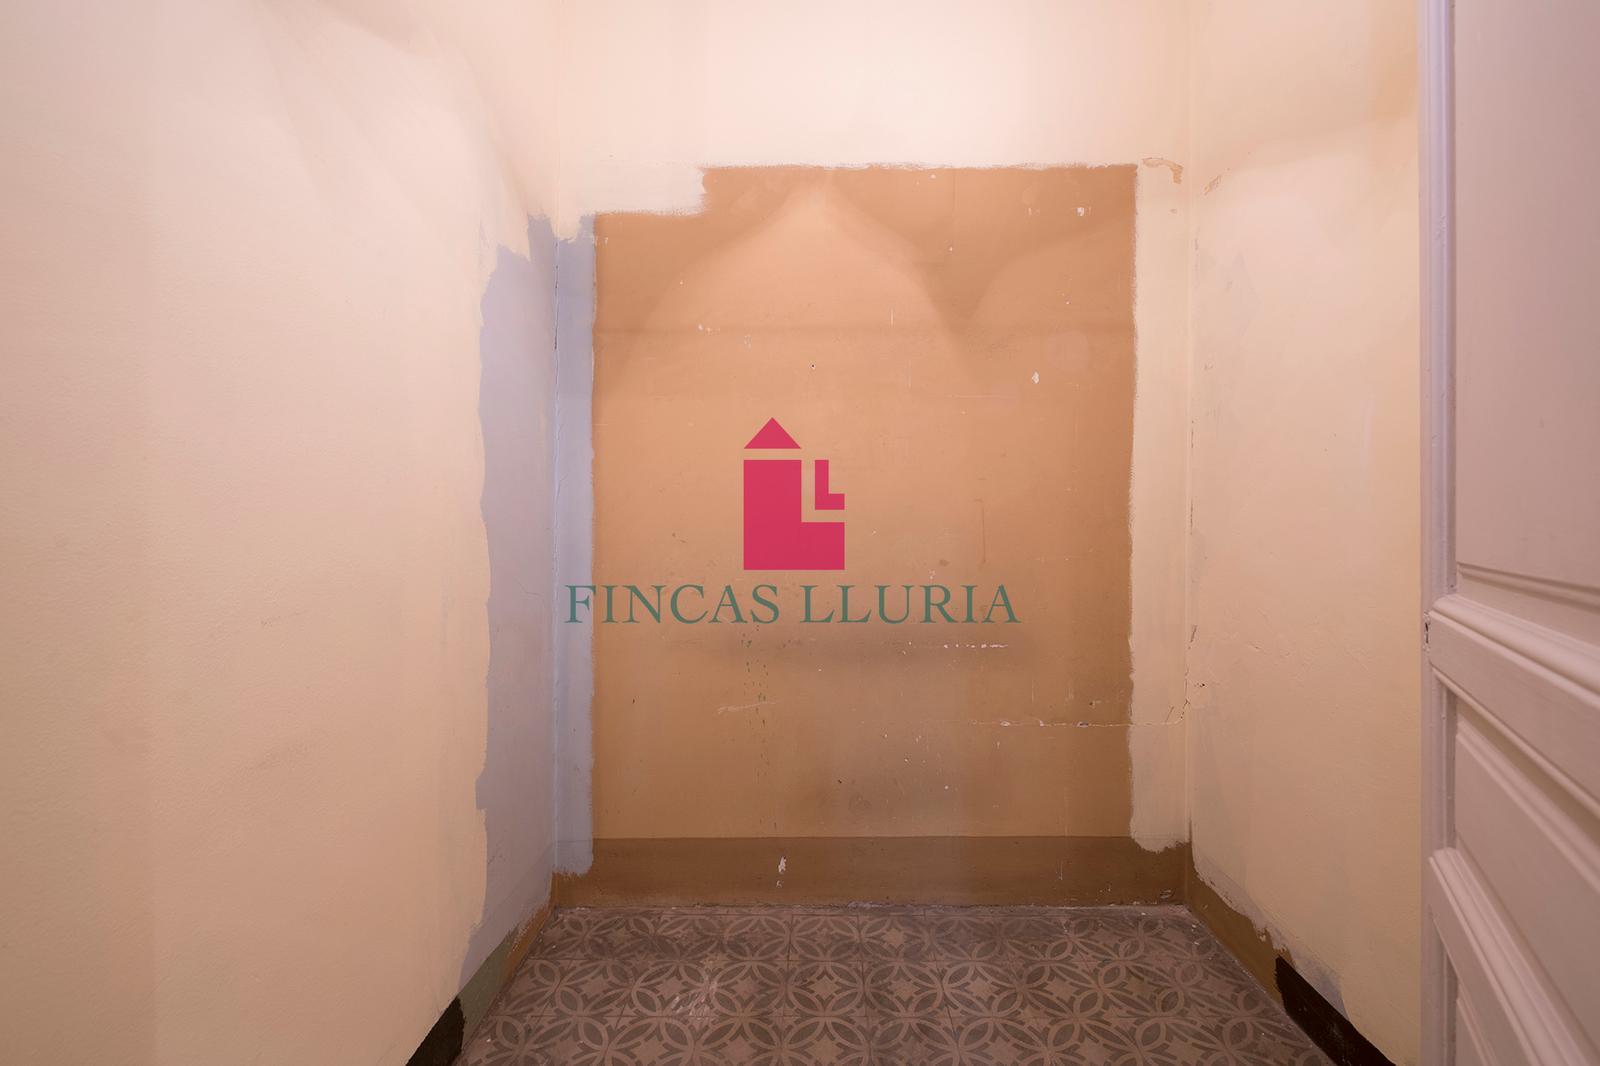 Ref.: 32083 - PIS FINCA REGIA PER REHABILITAR EN VENDA